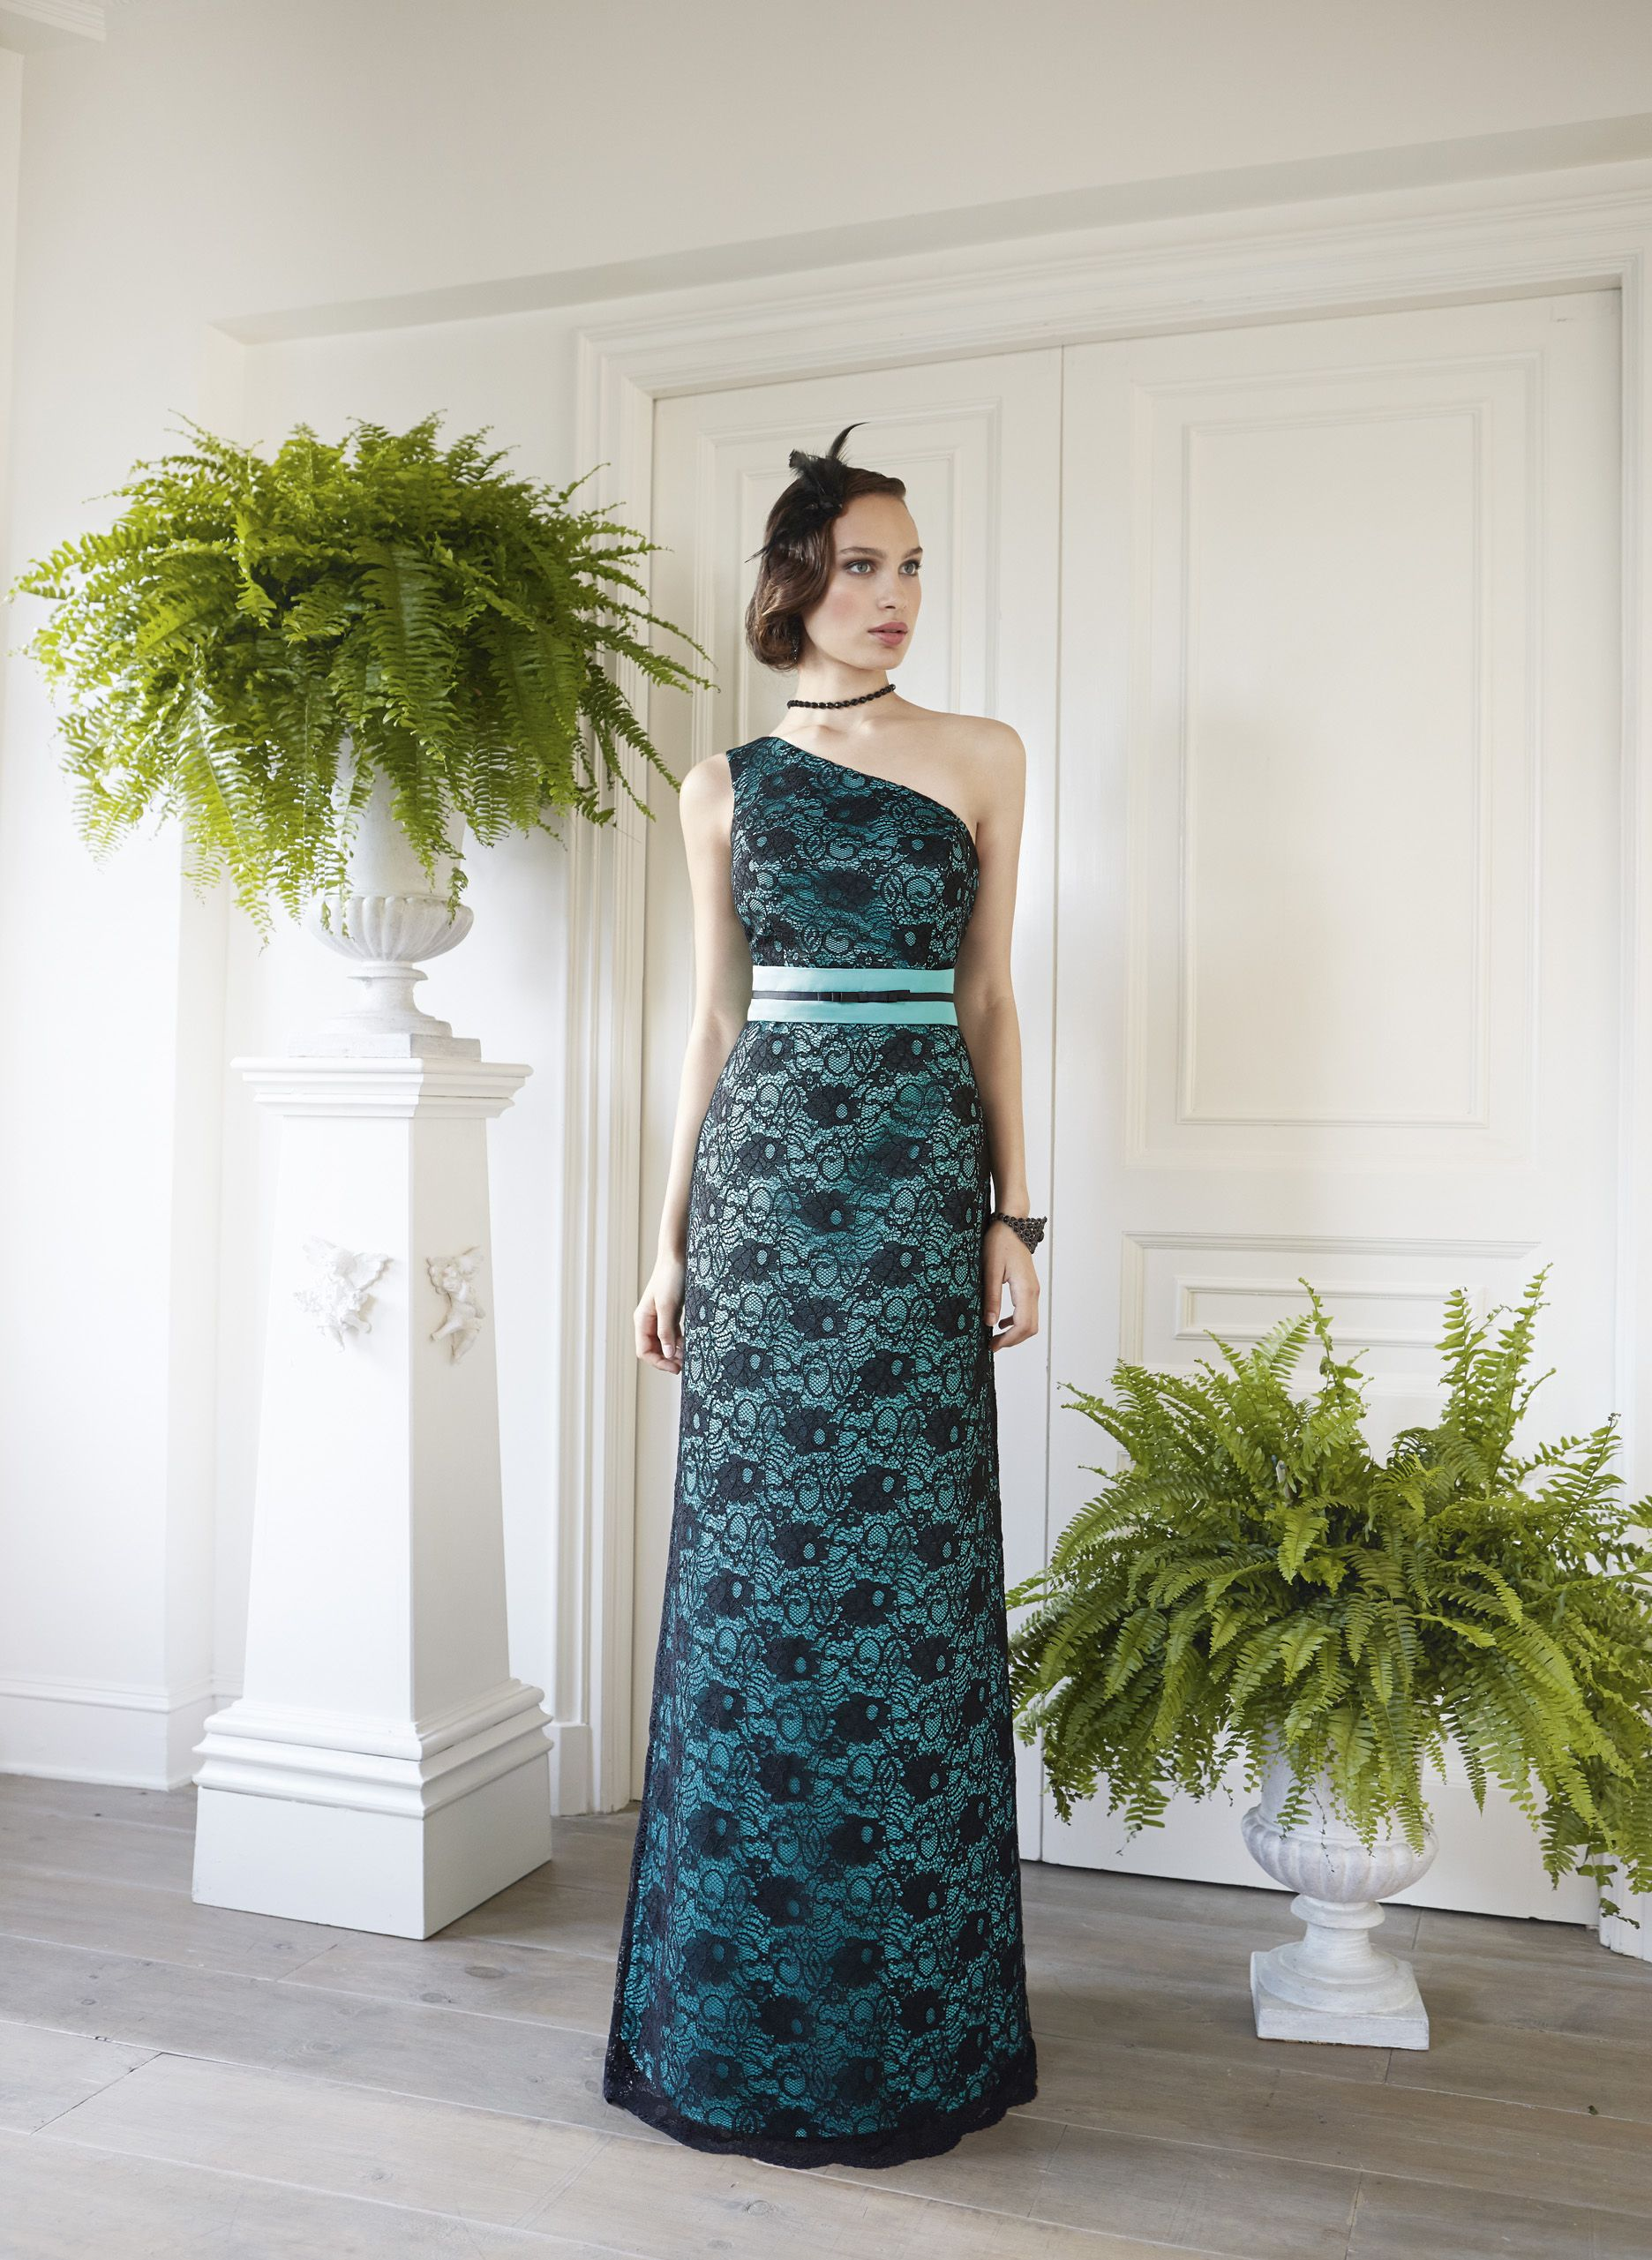 Coleccion De Nati Jimenez En Mayka Villena Vestidos De Fiesta Vestidos De Gala Vestidos Formales